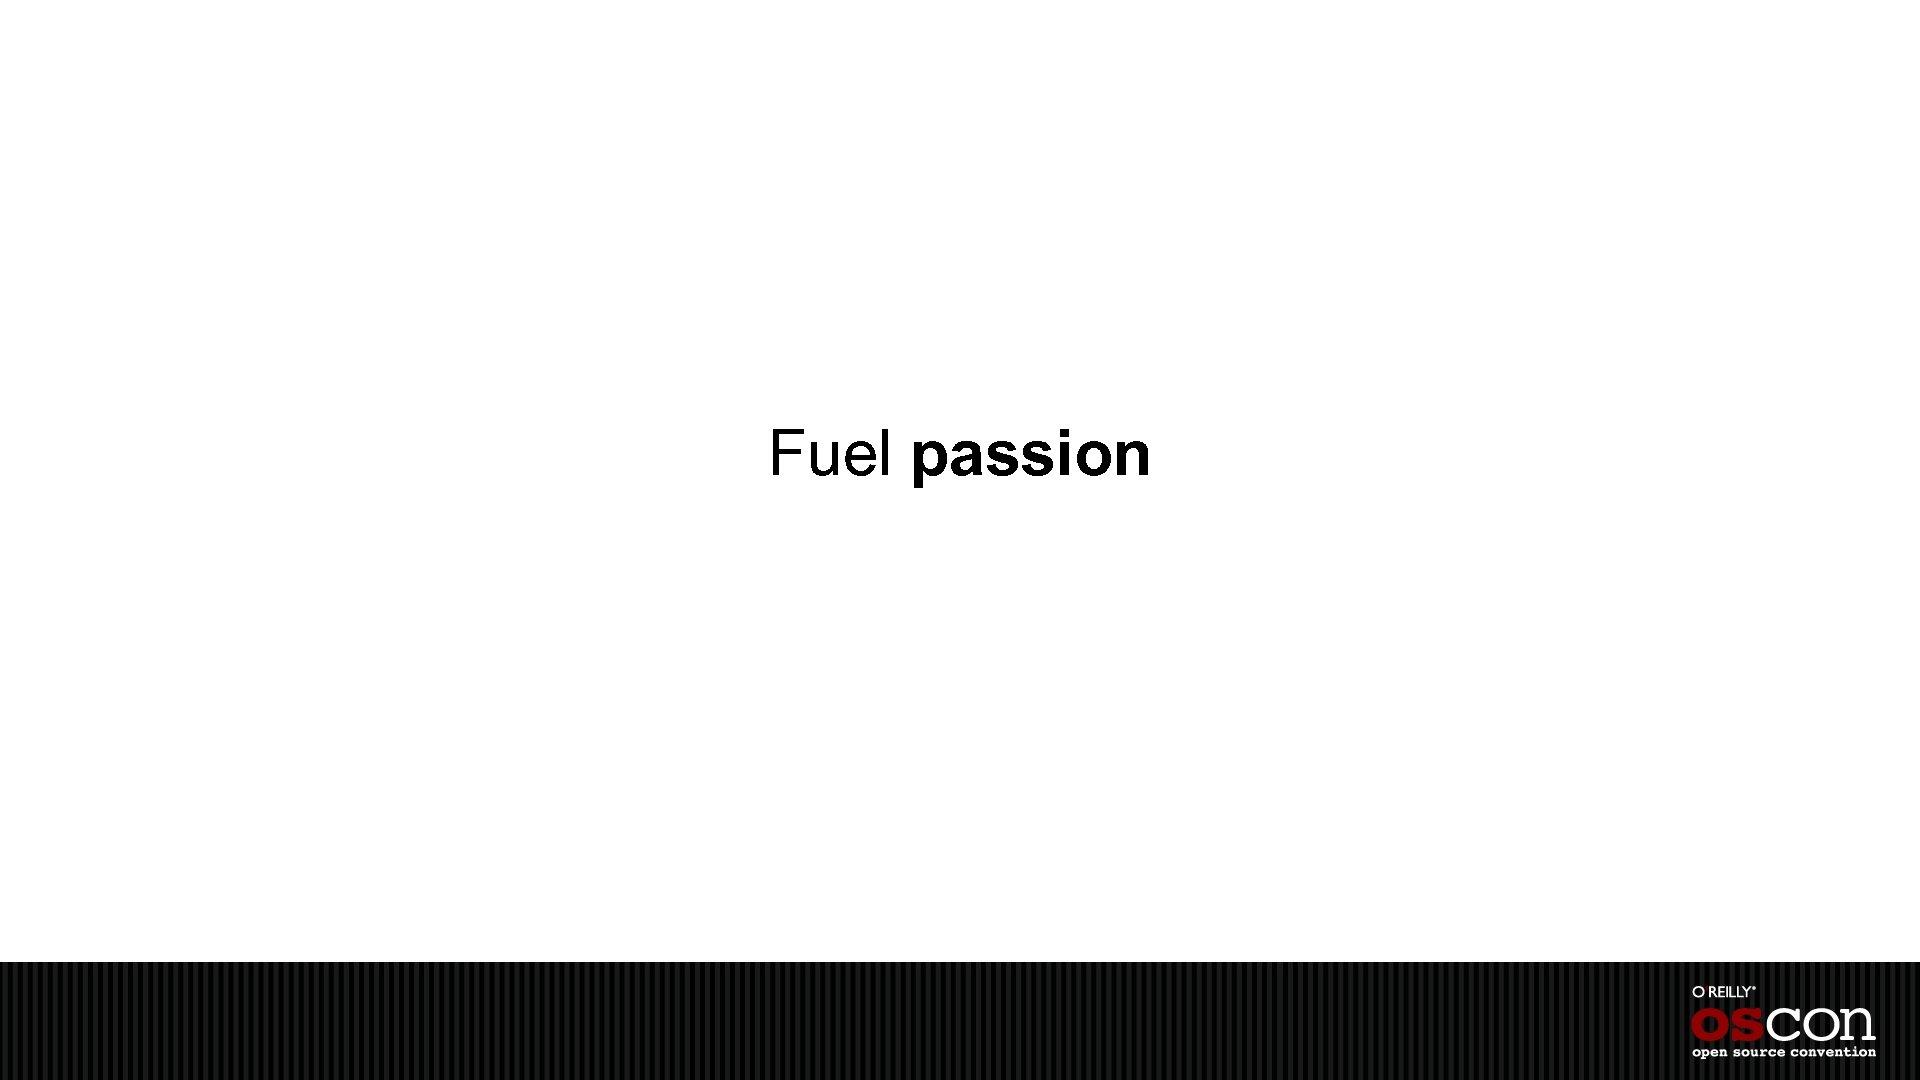 Fuel passion